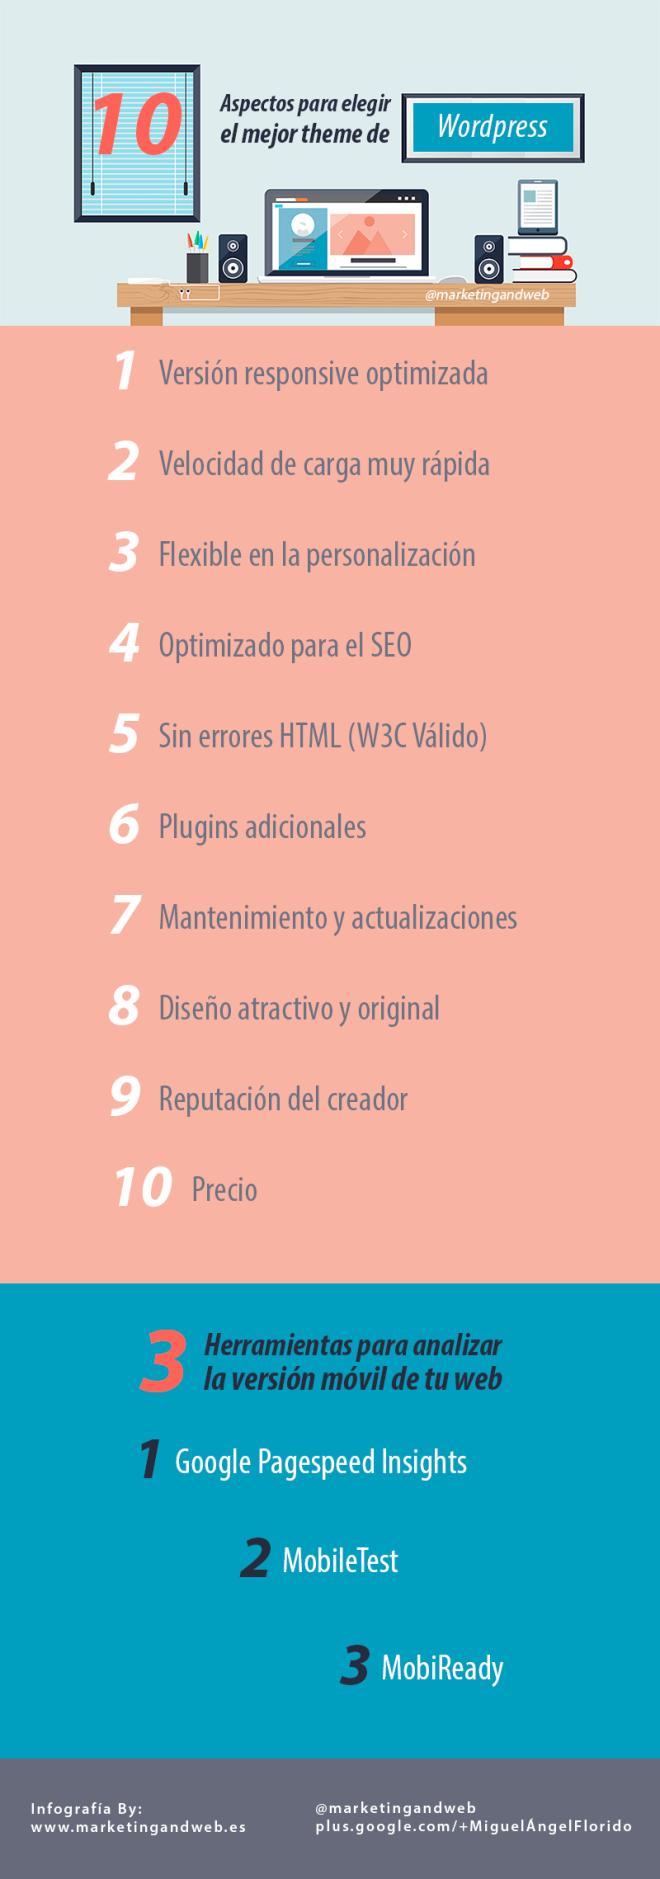 10 aspectos a considerar para elegir un buen Tema para WordPress